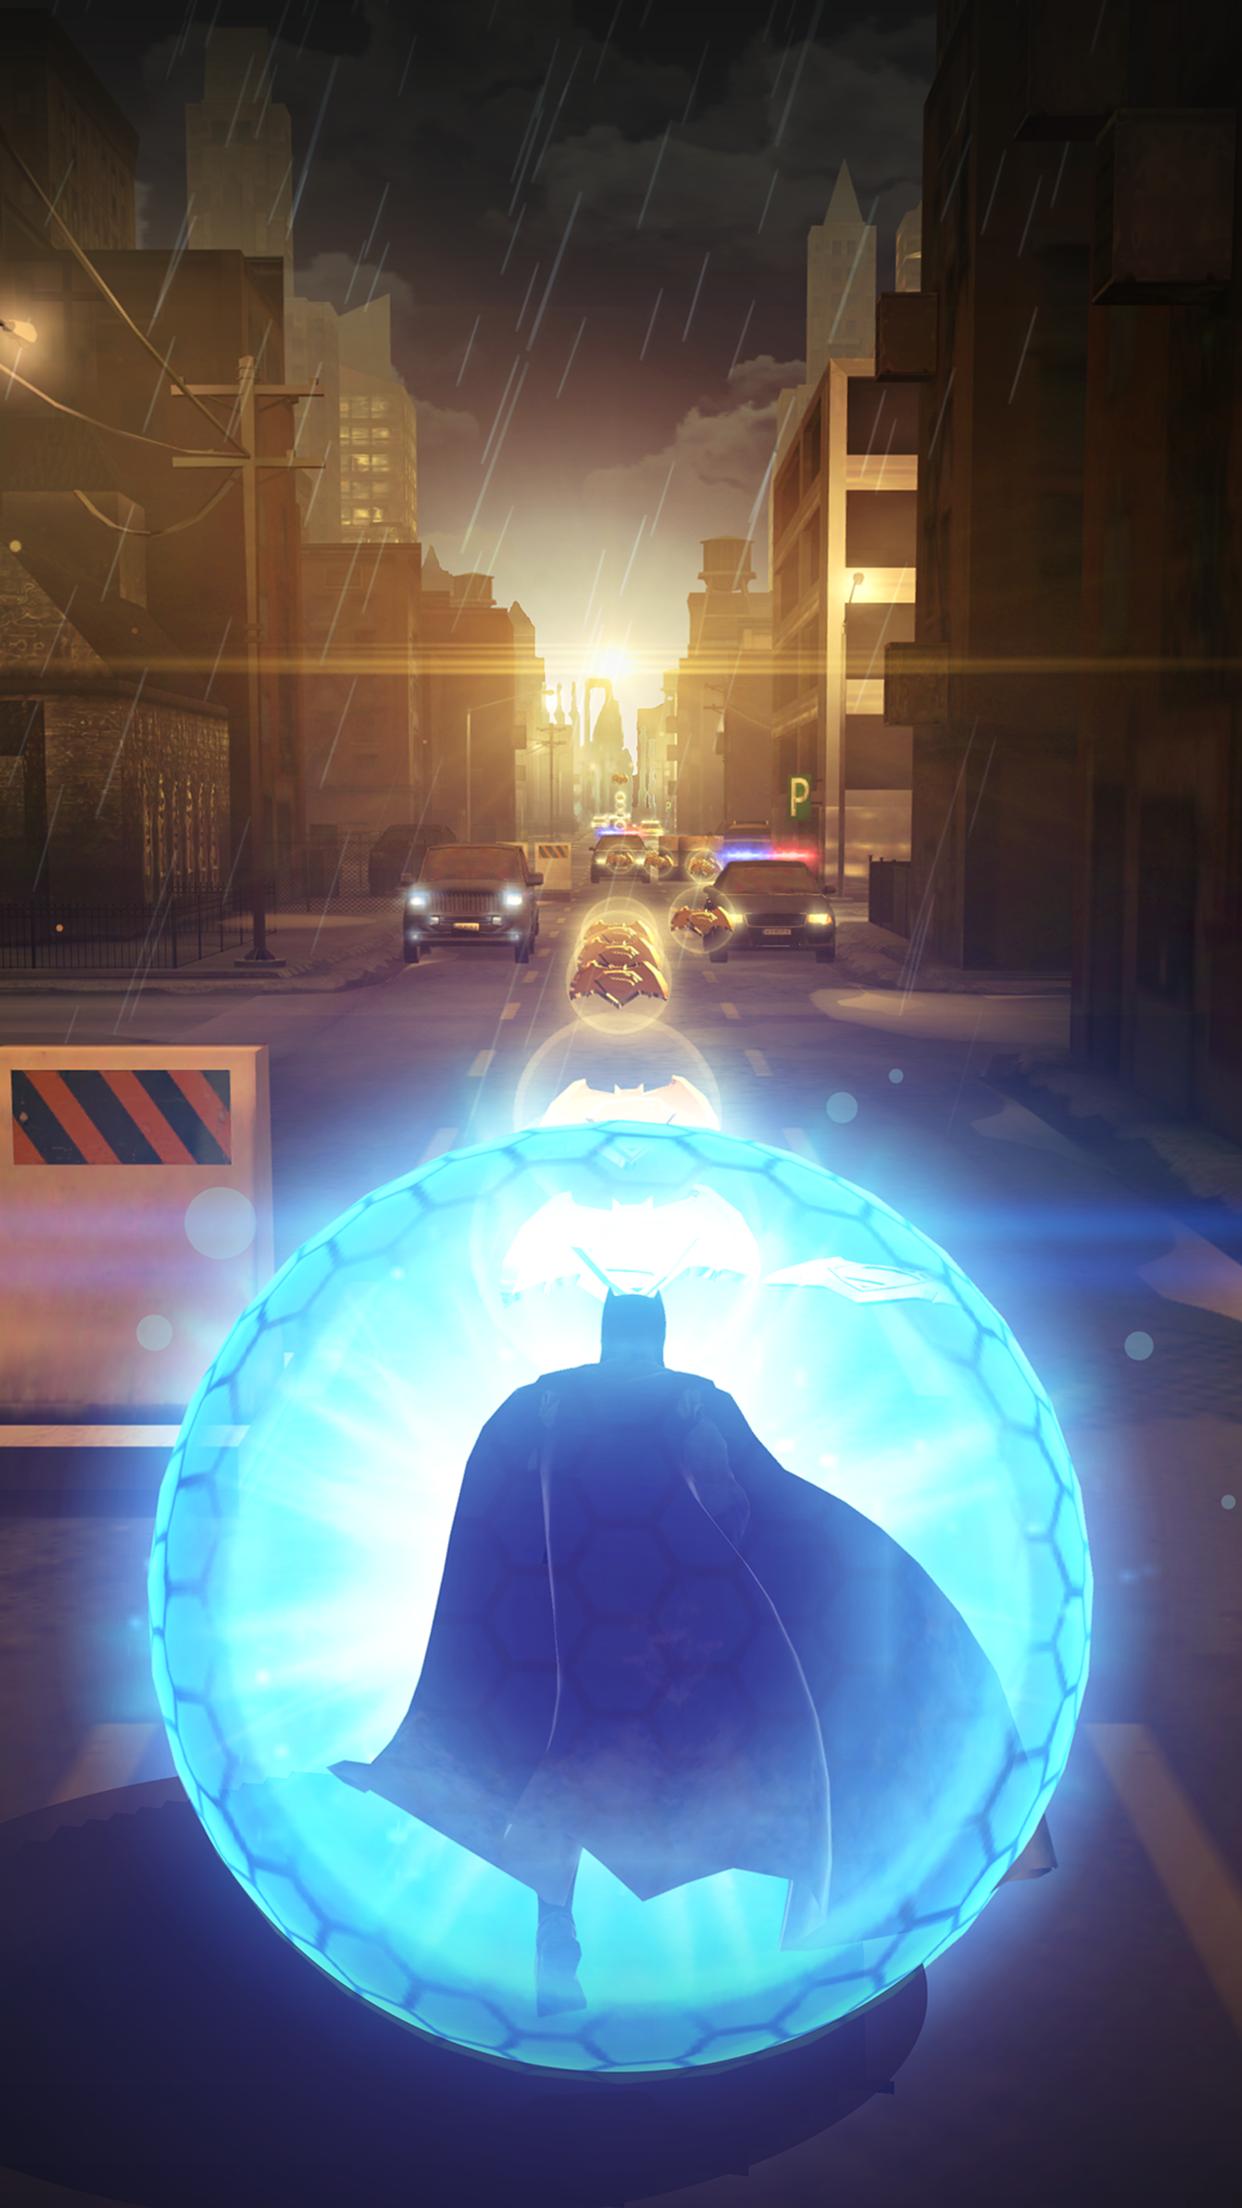 Batman v Superman Who Will Win screenshot #5